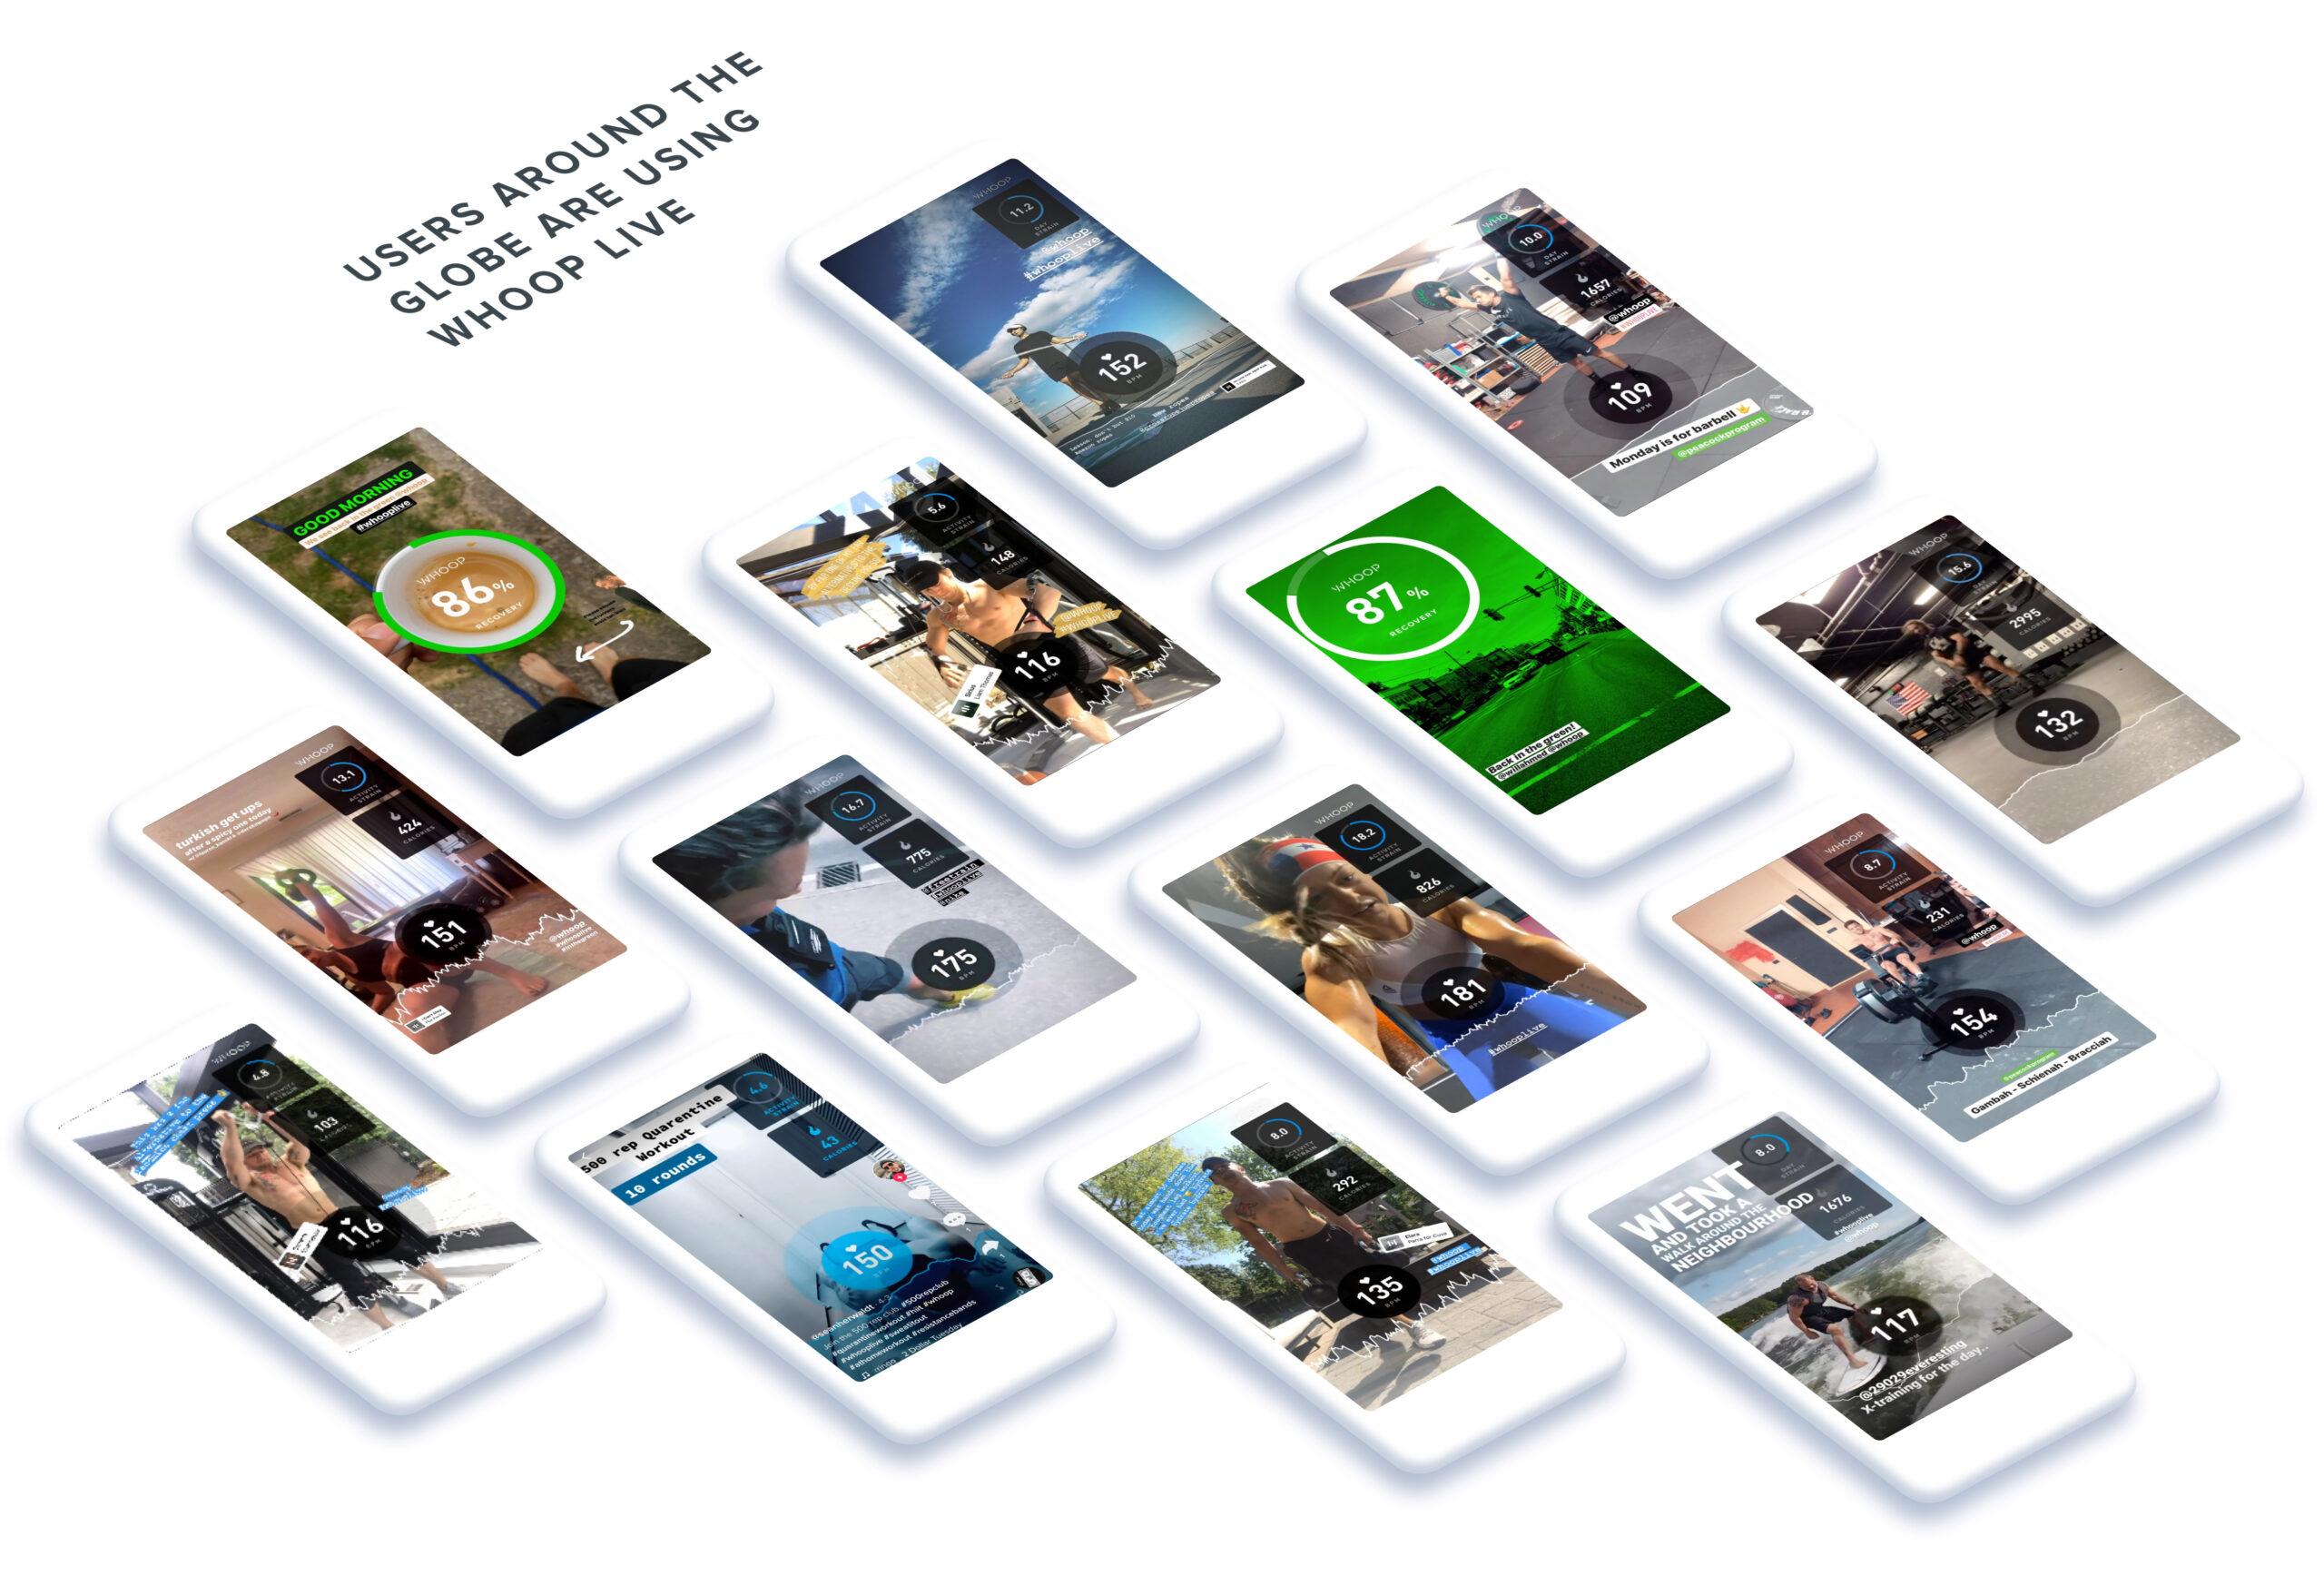 10-whoop-live-phones@3x